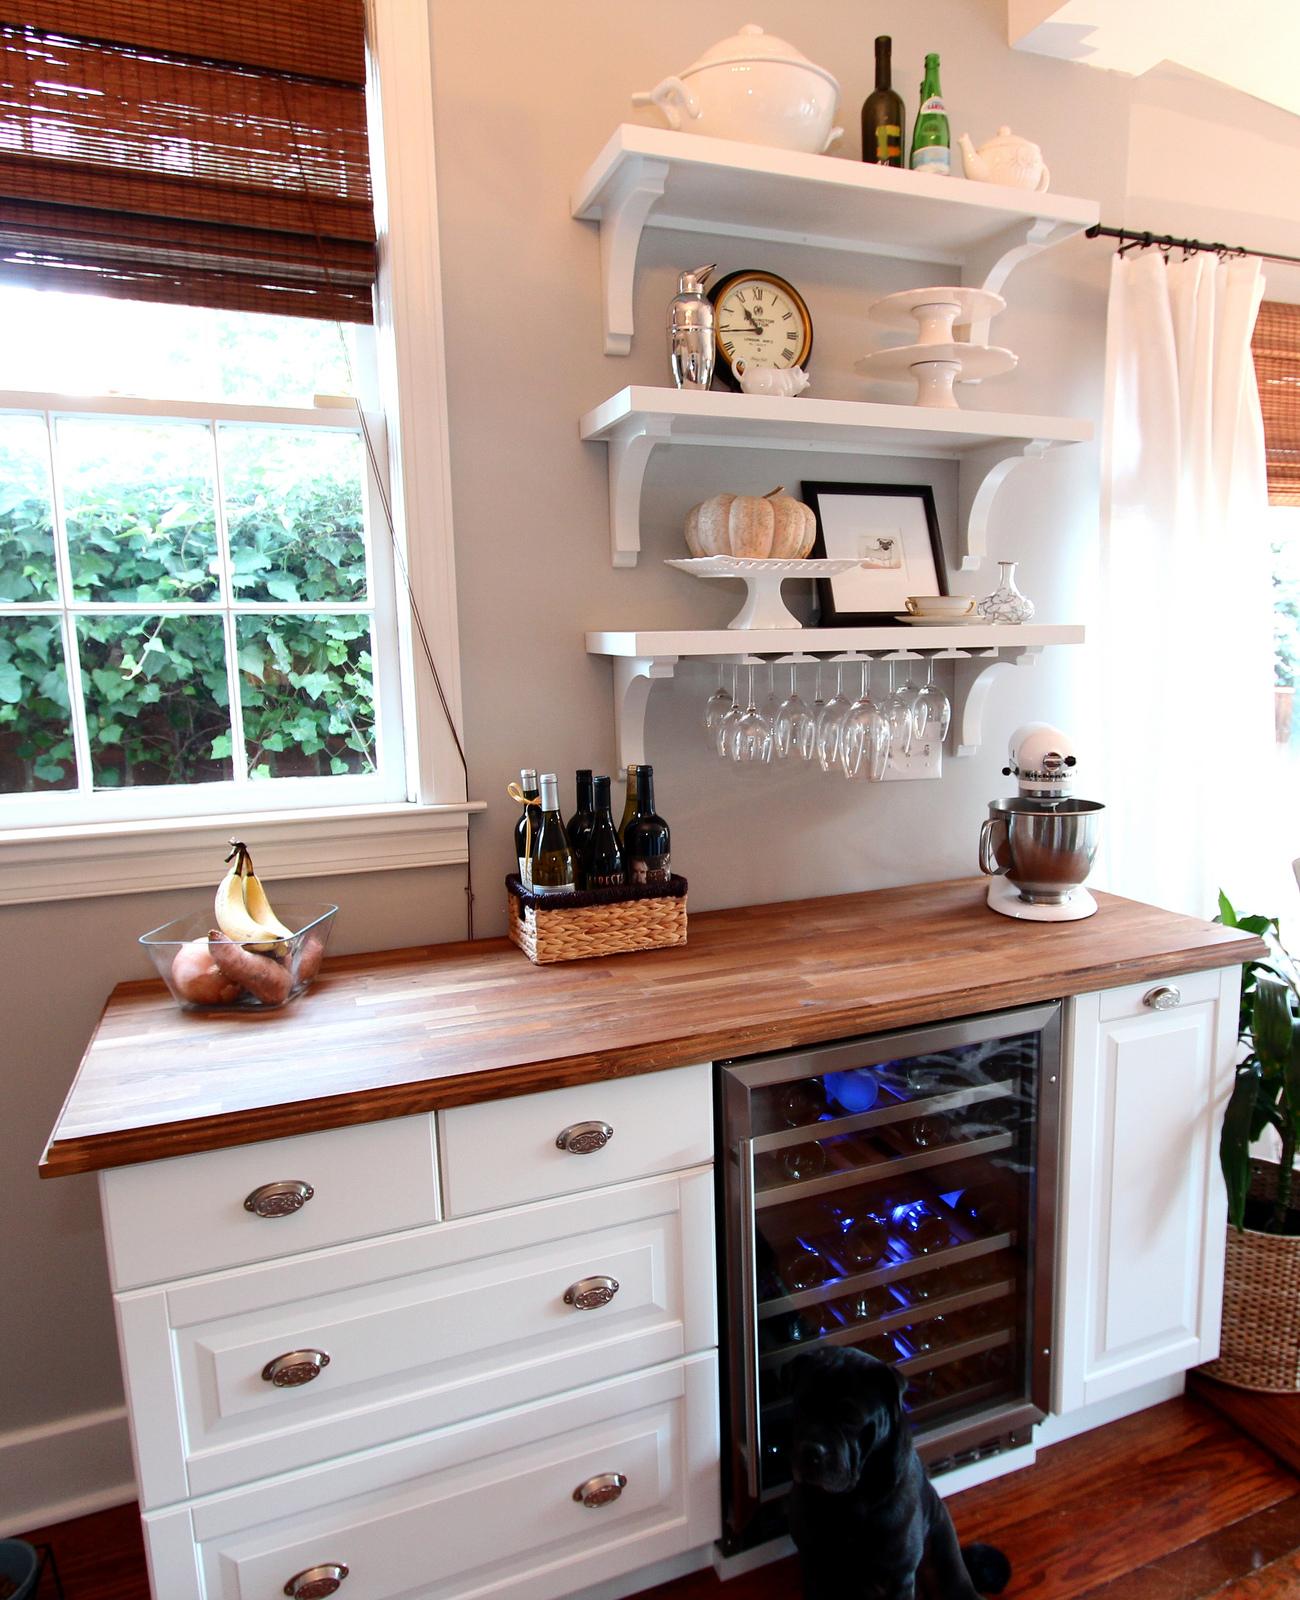 Wine Bar Decorating Ideas Home: NUMERAR + AKURUM + DIY = Chic Wine Bar